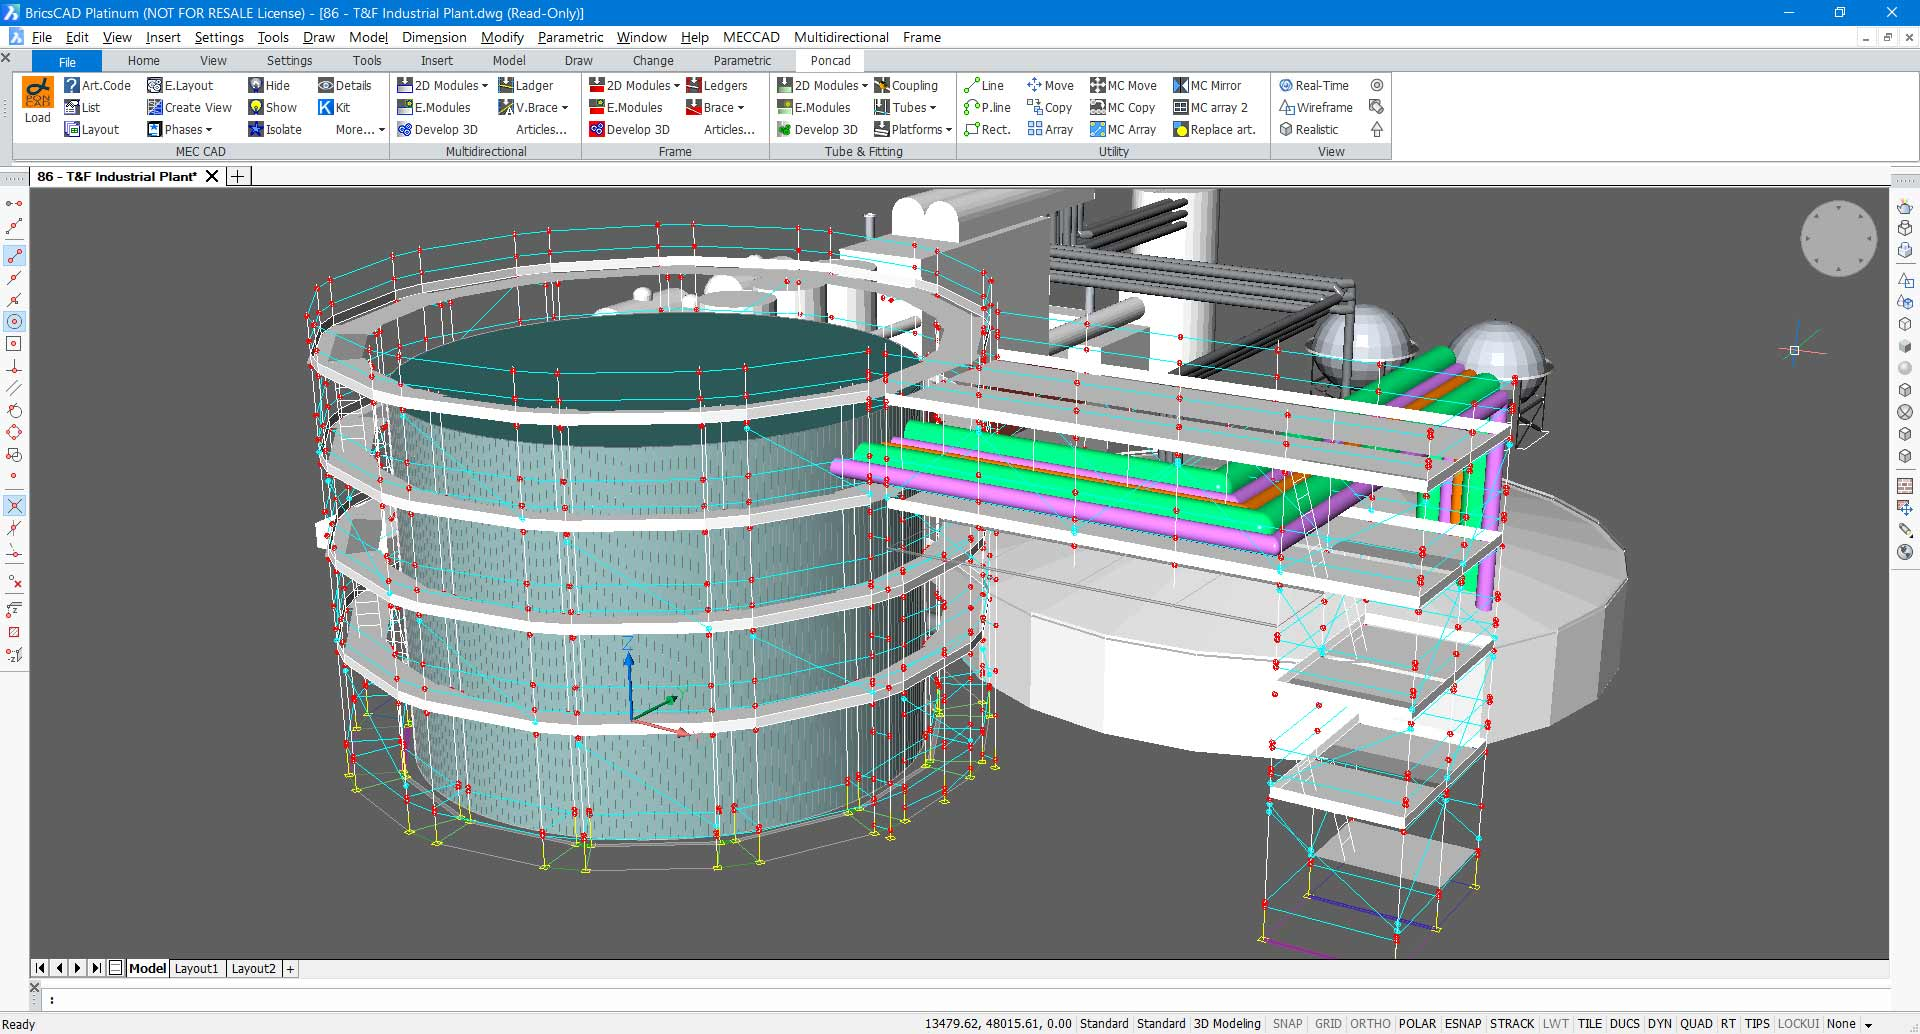 Scaffolding Designer software to Design & Estimate projects